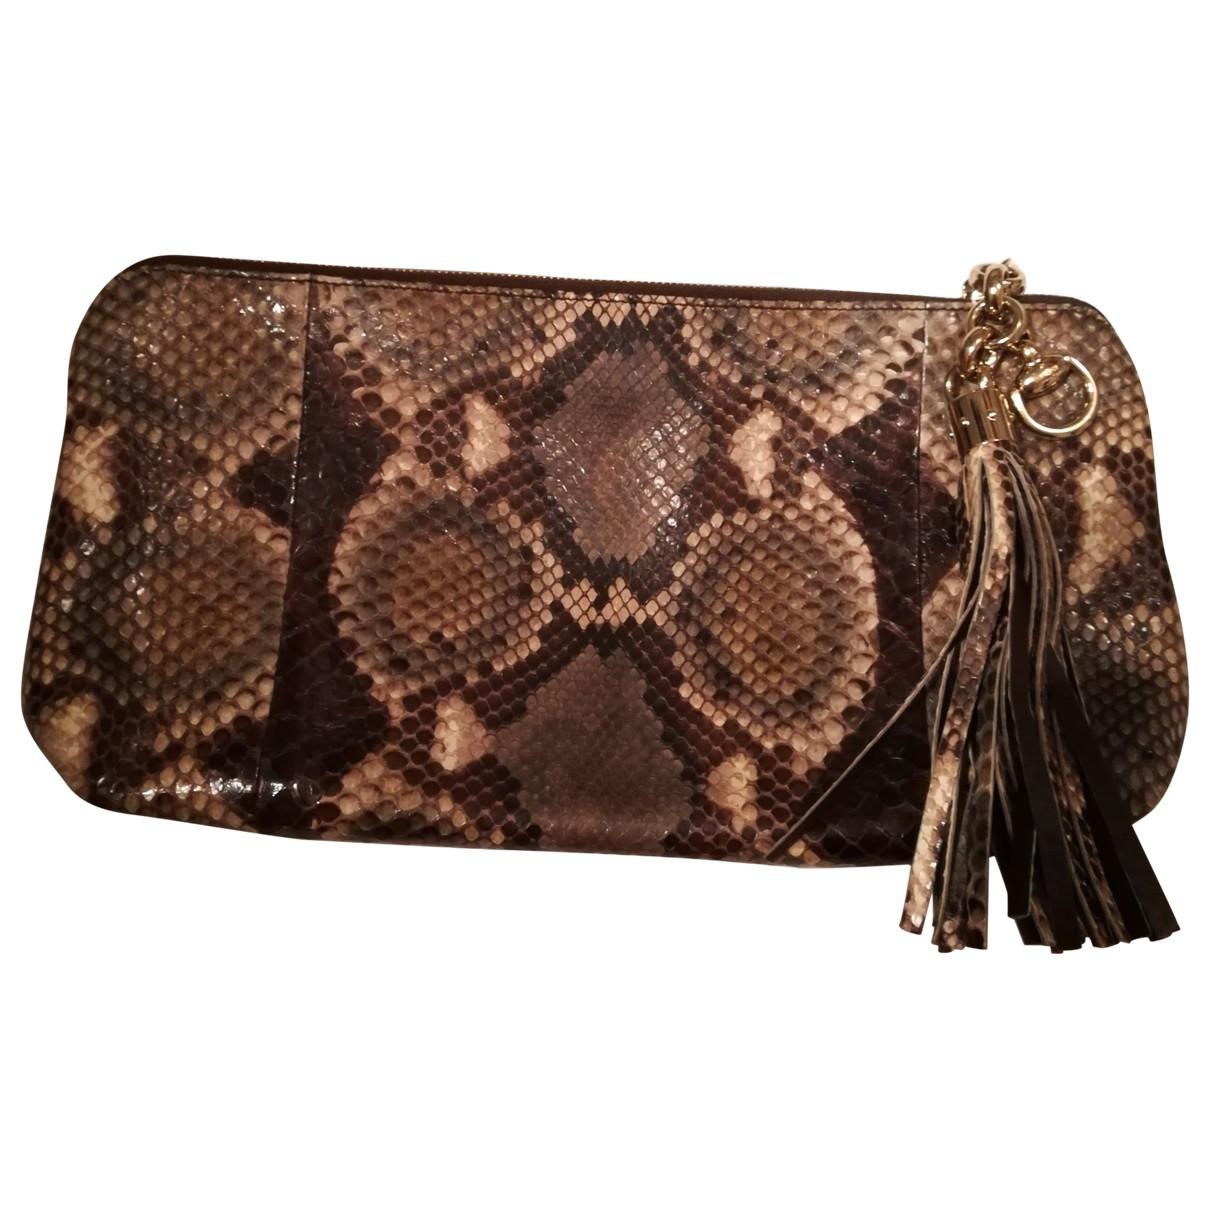 Gucci \N Khaki Python Clutch bag for Women \N